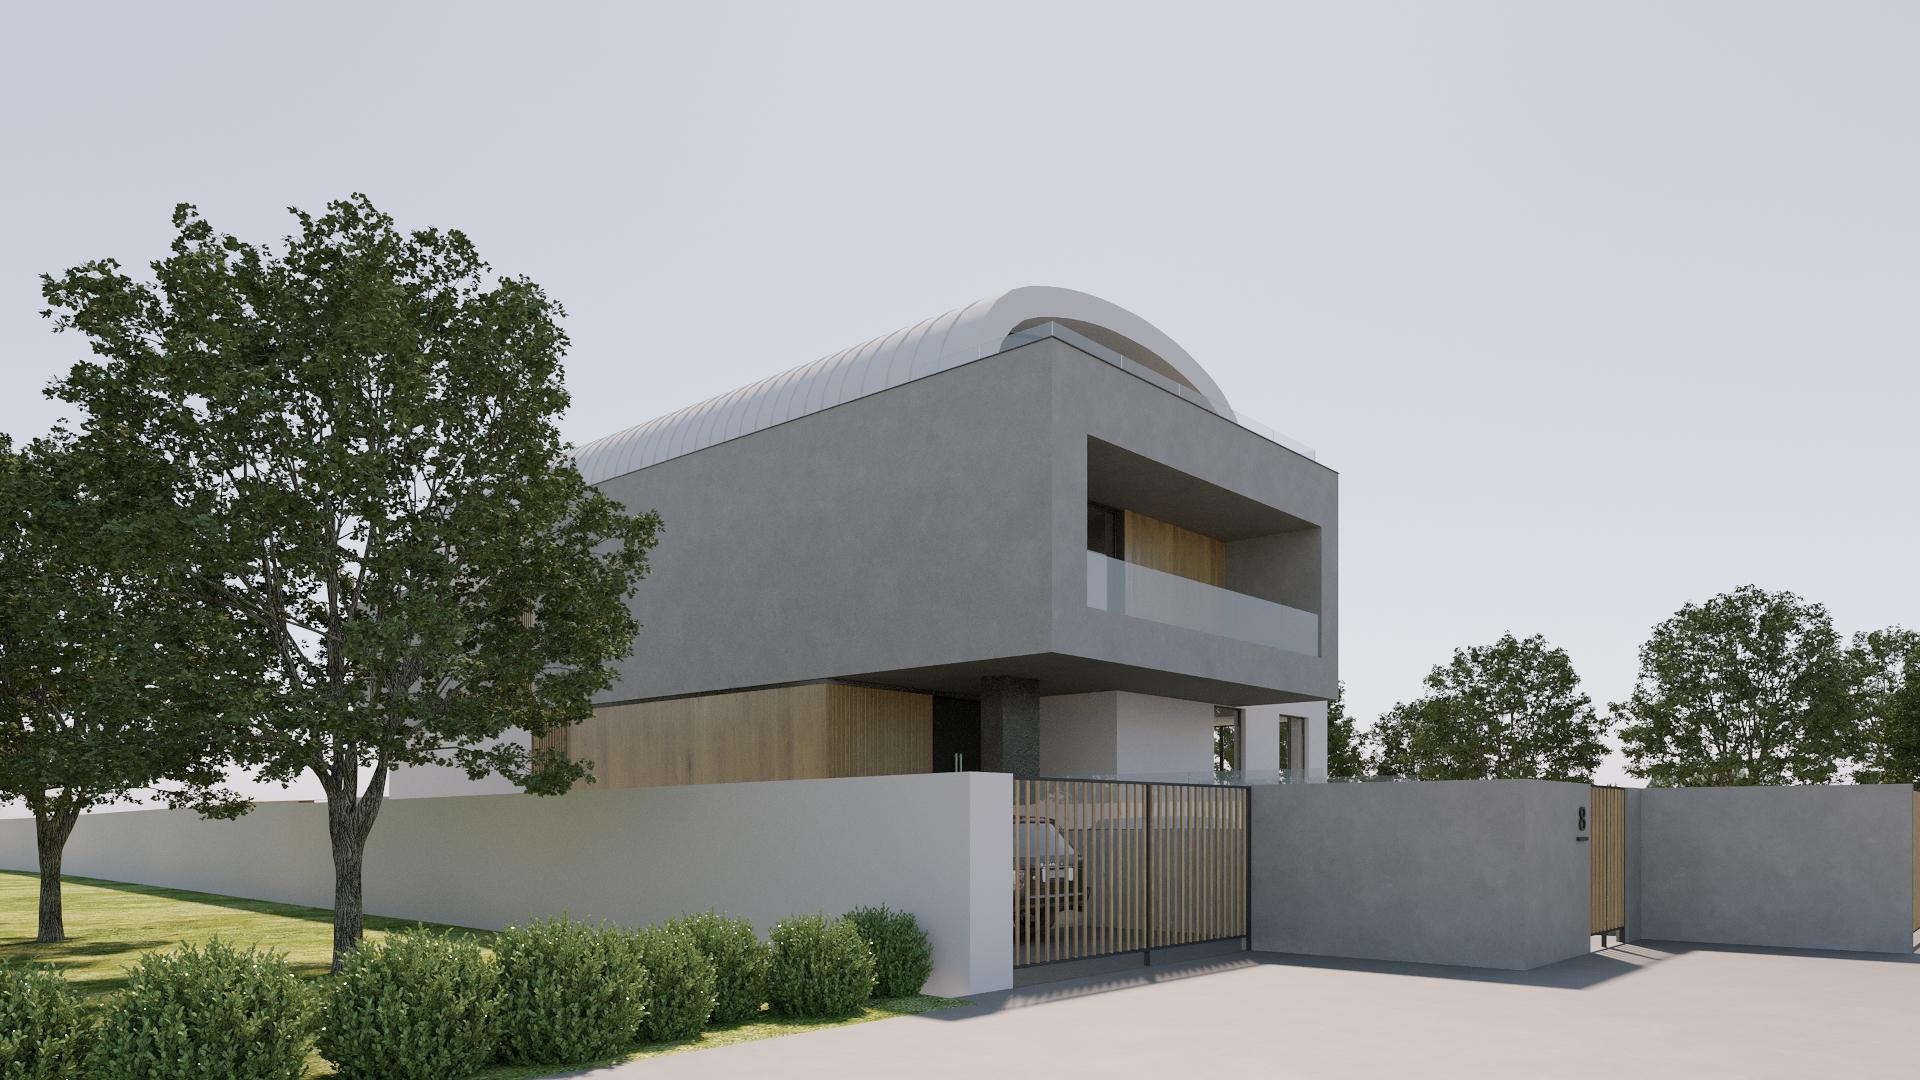 https://nbc-arhitect.ro/wp-content/uploads/2020/10/NBC-Arhitect-_-residences-_-Mogo-Villa-2-_-Romania-_-exterior-view_7.jpg